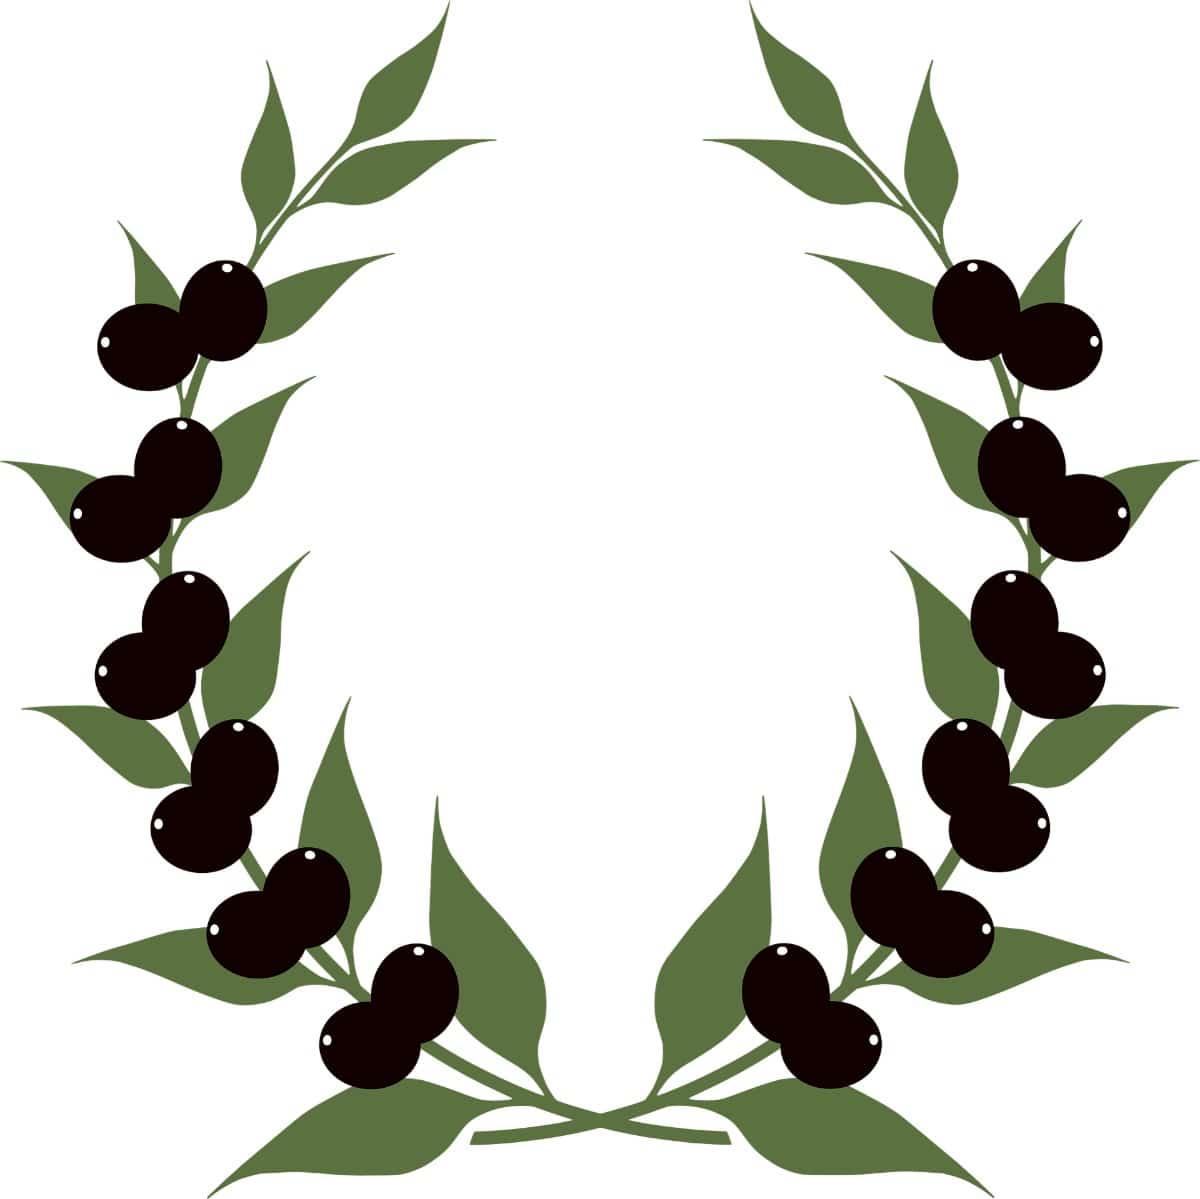 Corona de ramas de olivo con olivas negras